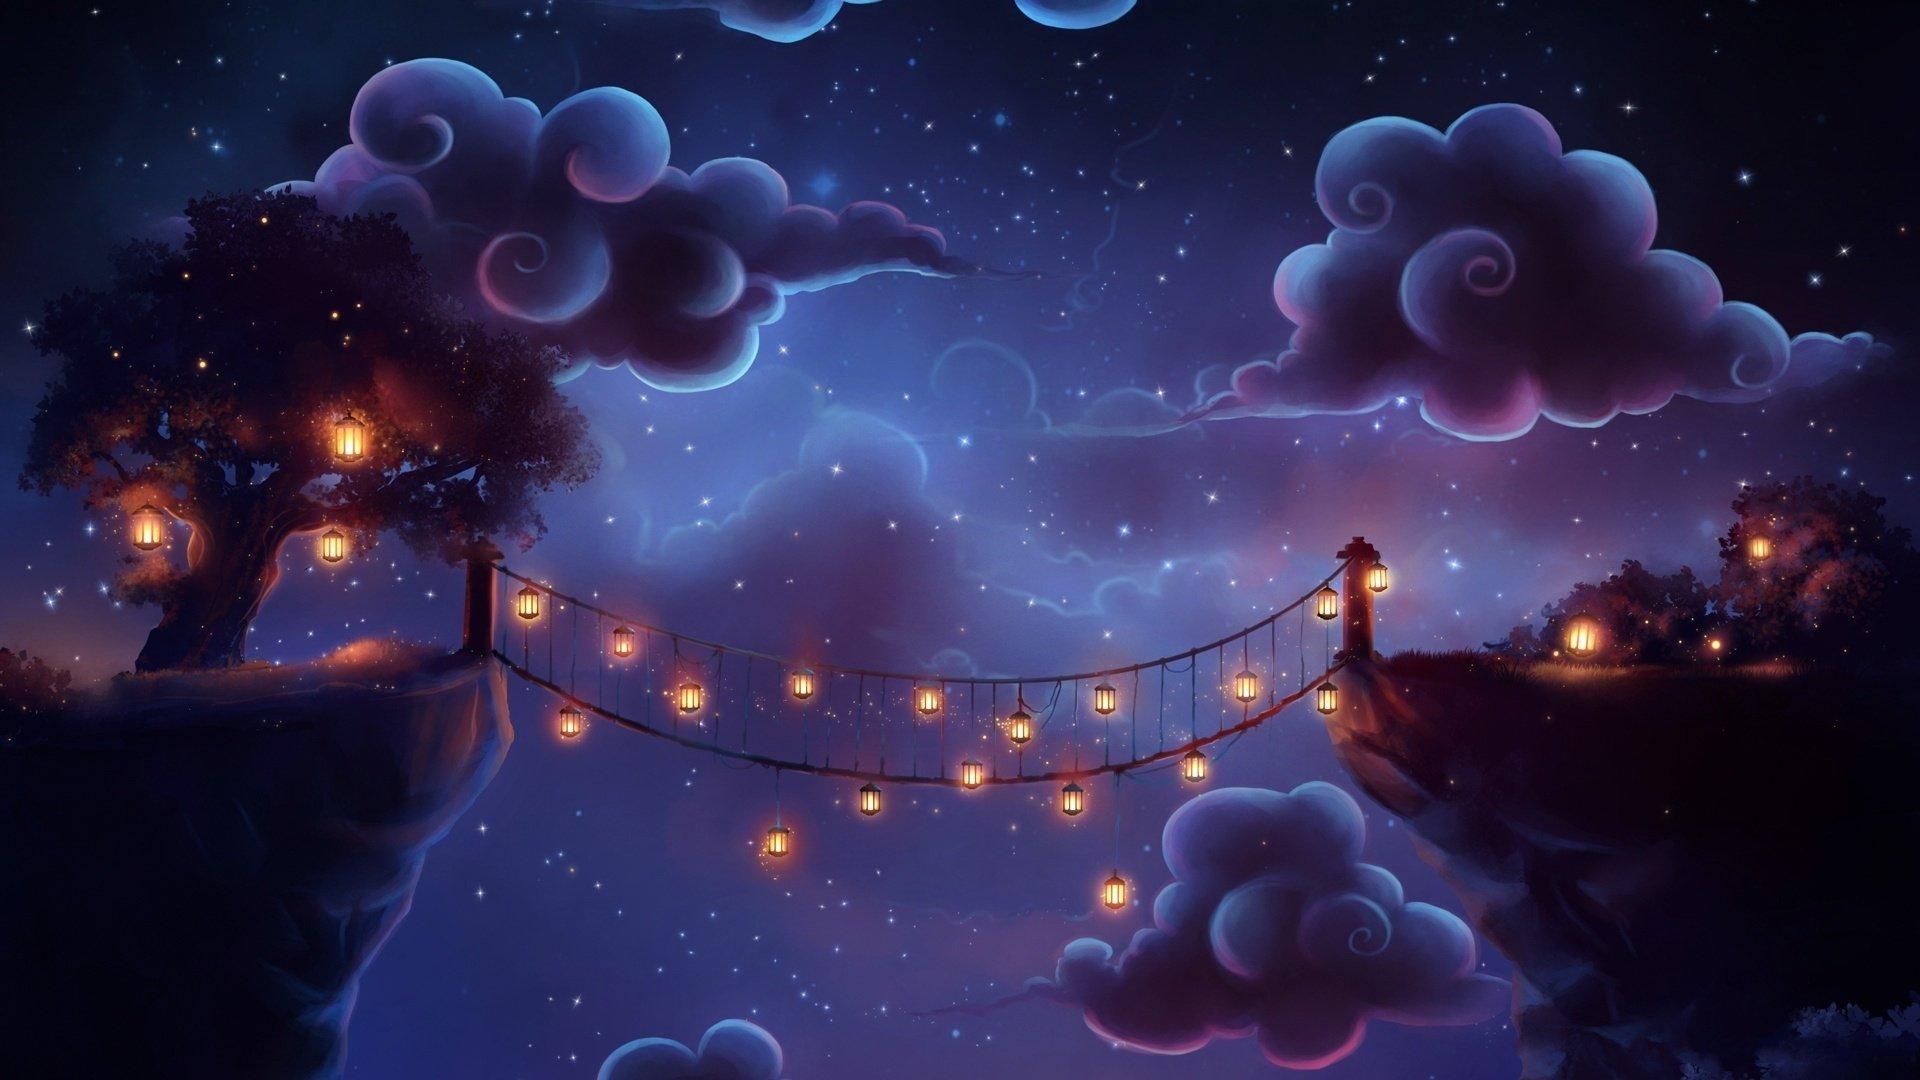 Bridge flashlights clouds night fantasy magic wallpaper - Fantasy wallpaper bridge ...